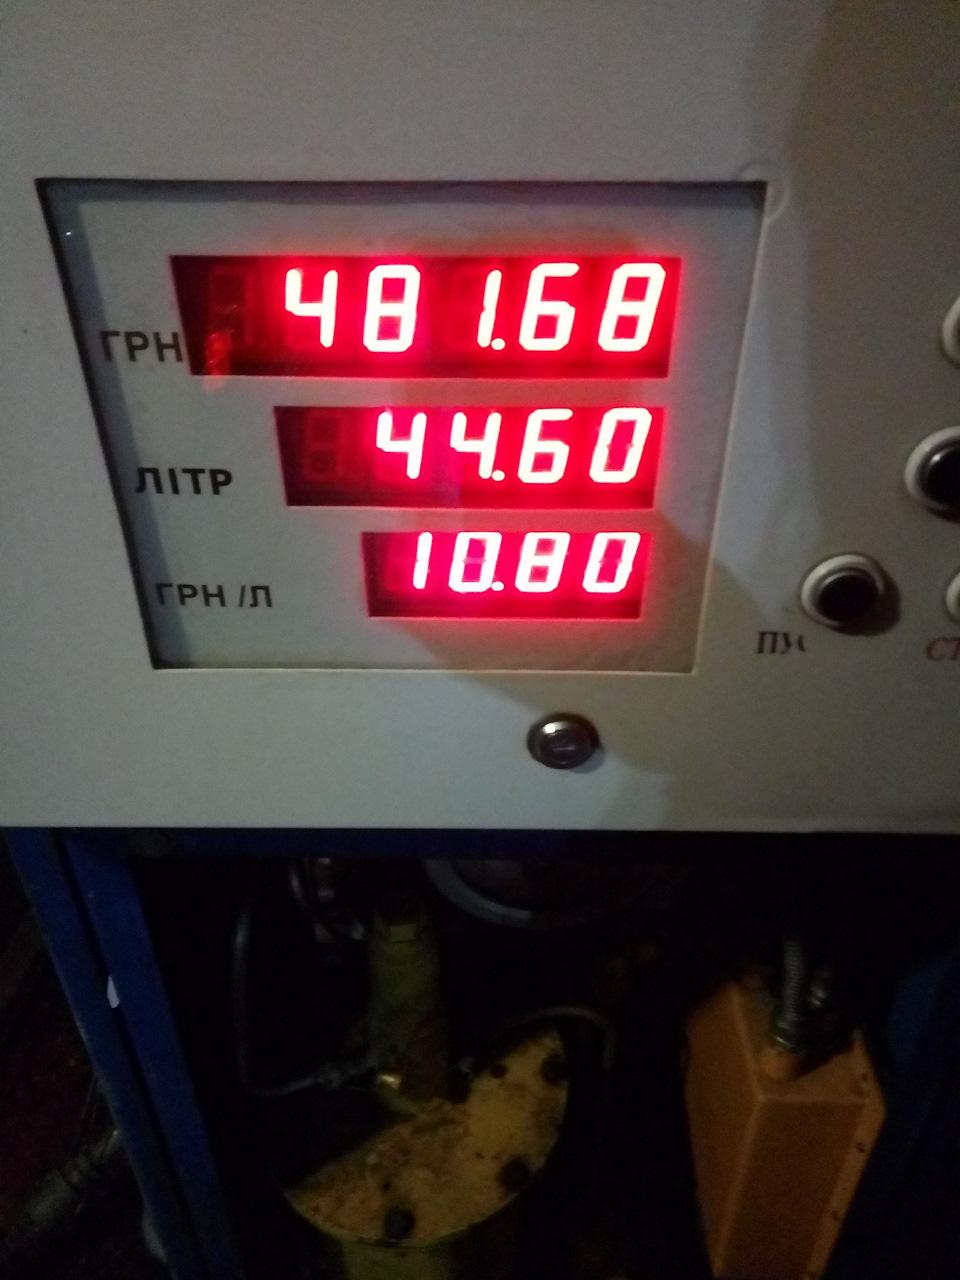 75c41ads-960.jpg